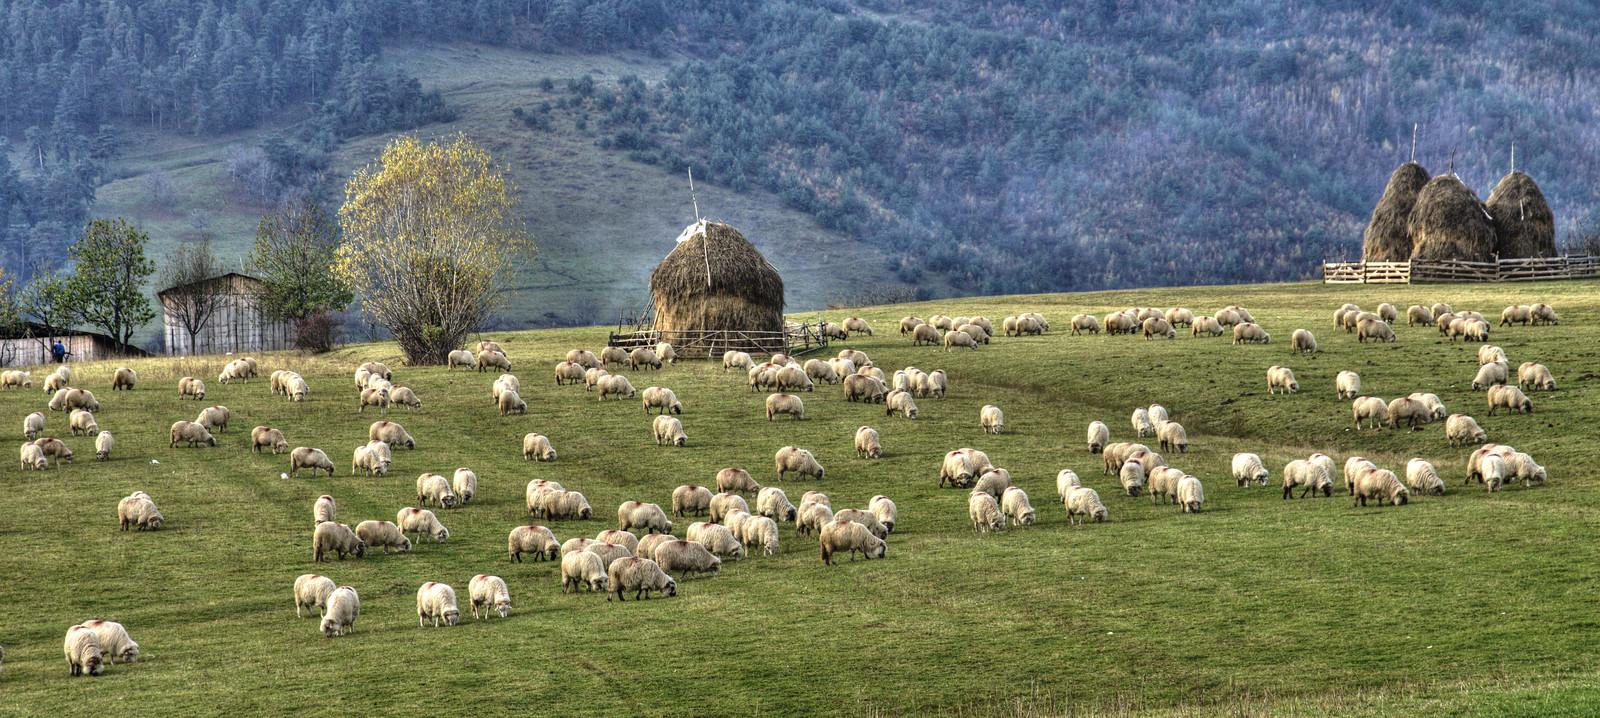 Pâturage à proximité de Rășinari, Roumanie